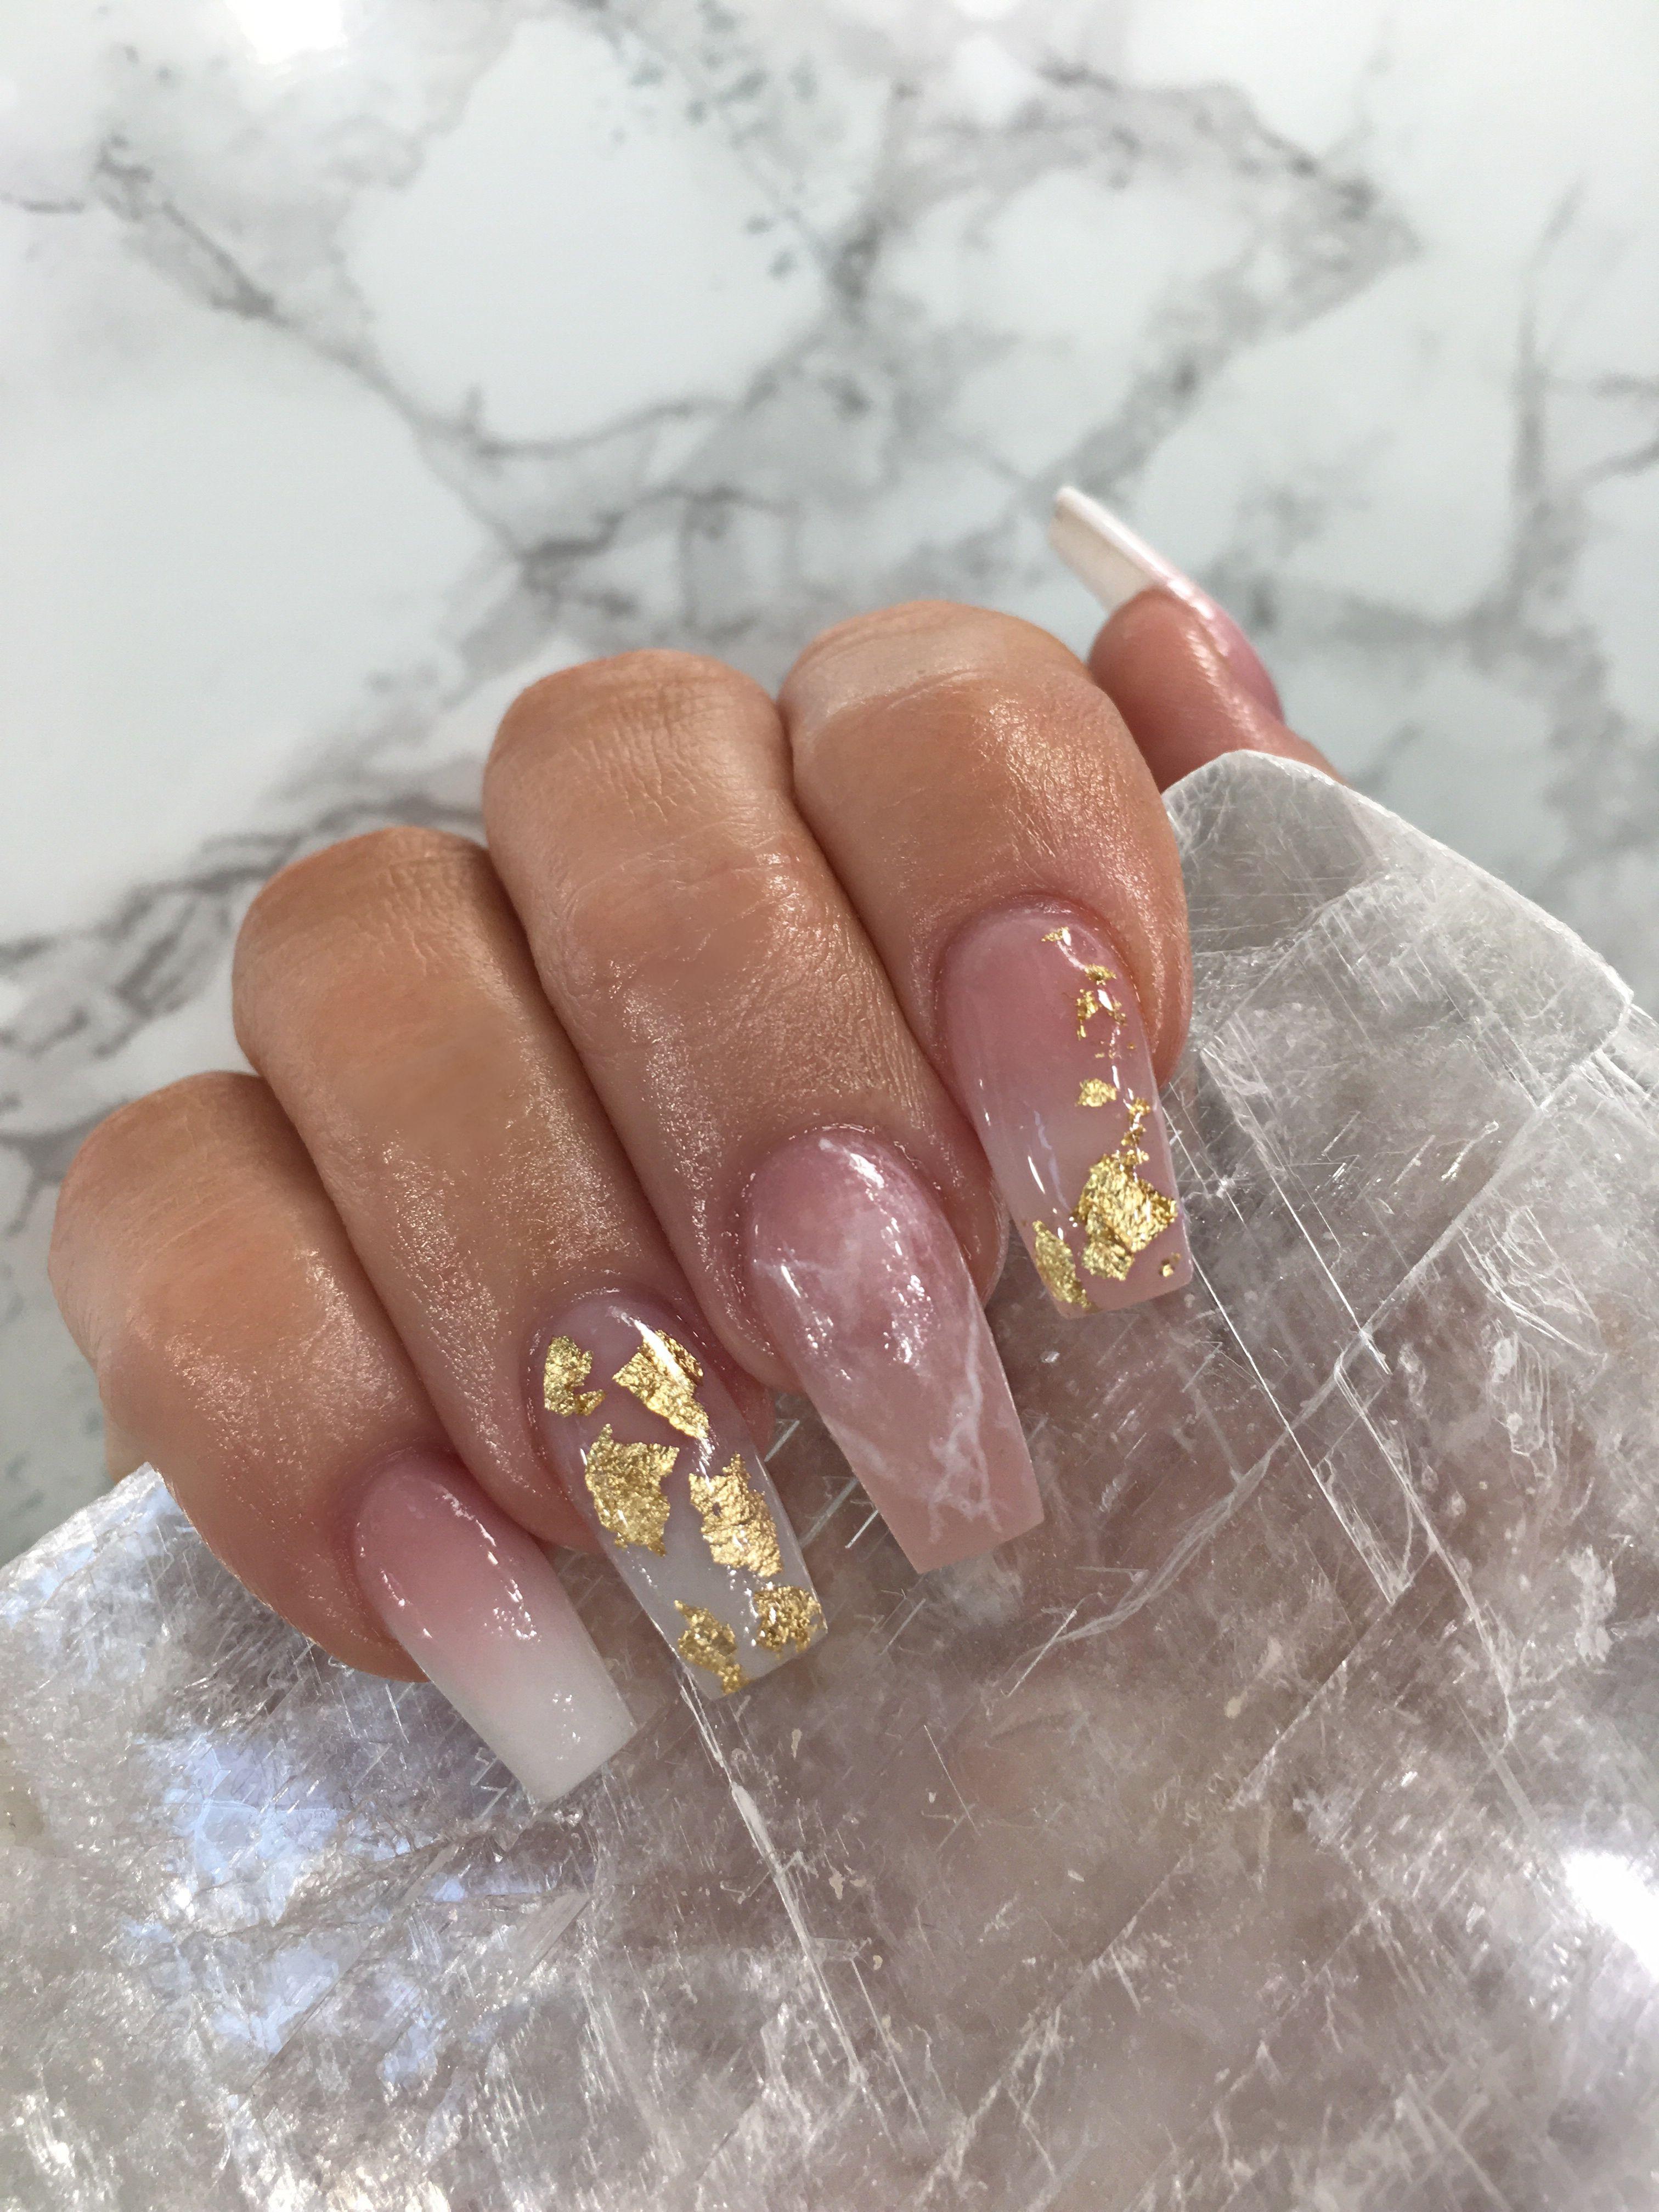 Marble Nails Https Instagram Com P Boec6h5gb5w Cute